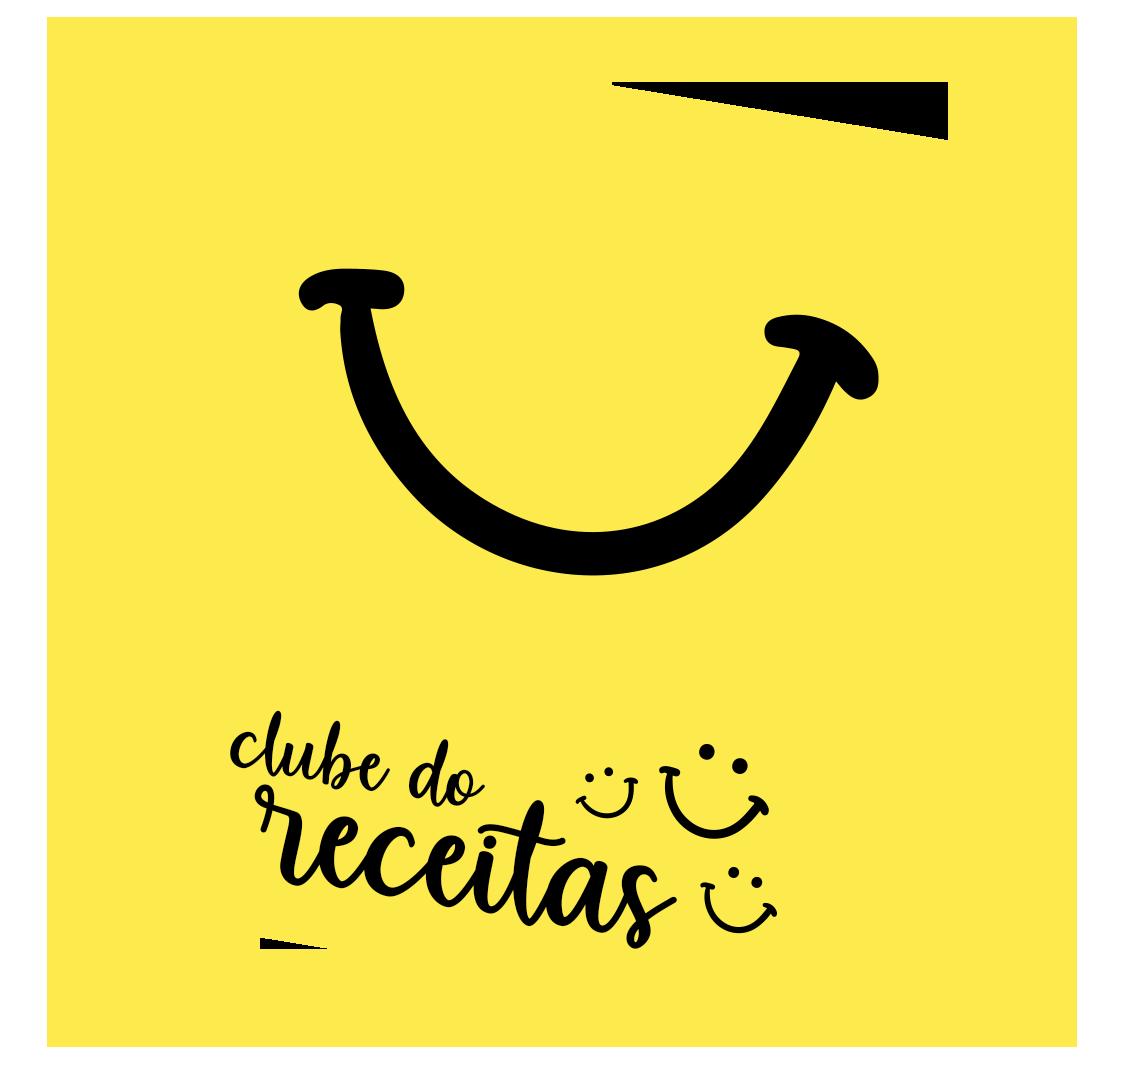 https://receitaspraserfeliz.com.br/wp-content/uploads/2020/10/sitesacola.png